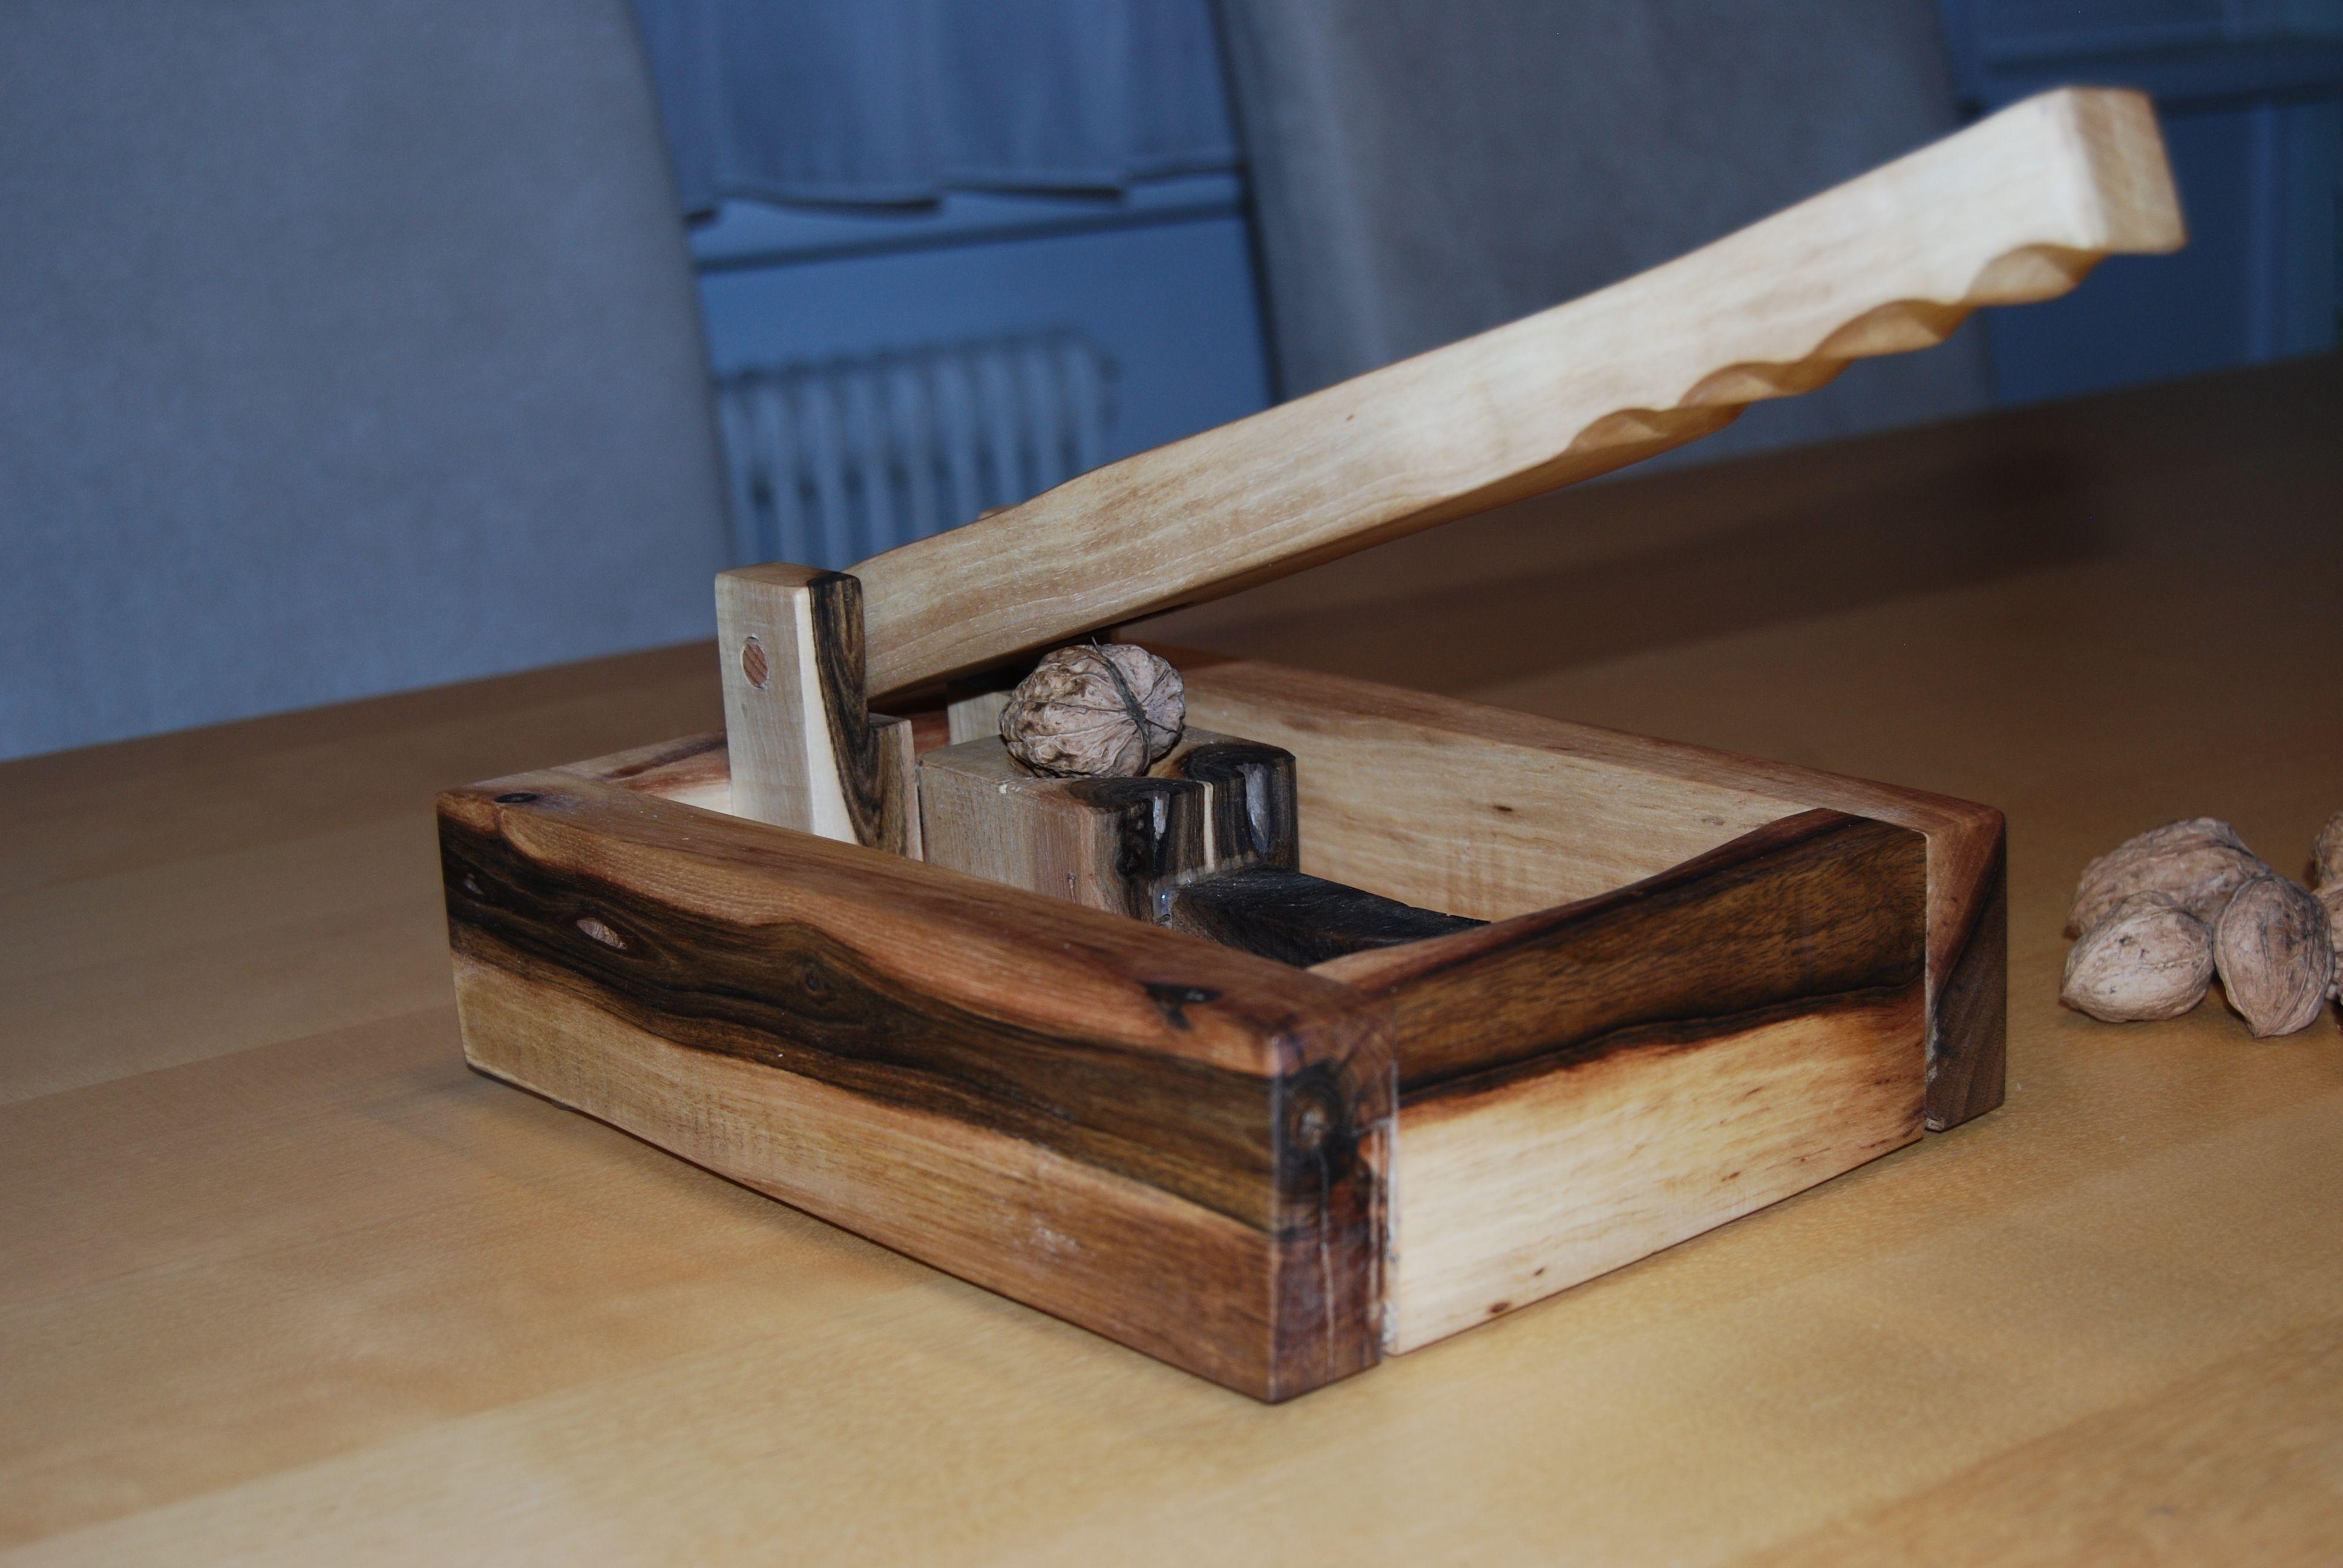 nussknacker aus nussholz was denn sonst version 1 0 anleitung hoizbastla s projekte. Black Bedroom Furniture Sets. Home Design Ideas